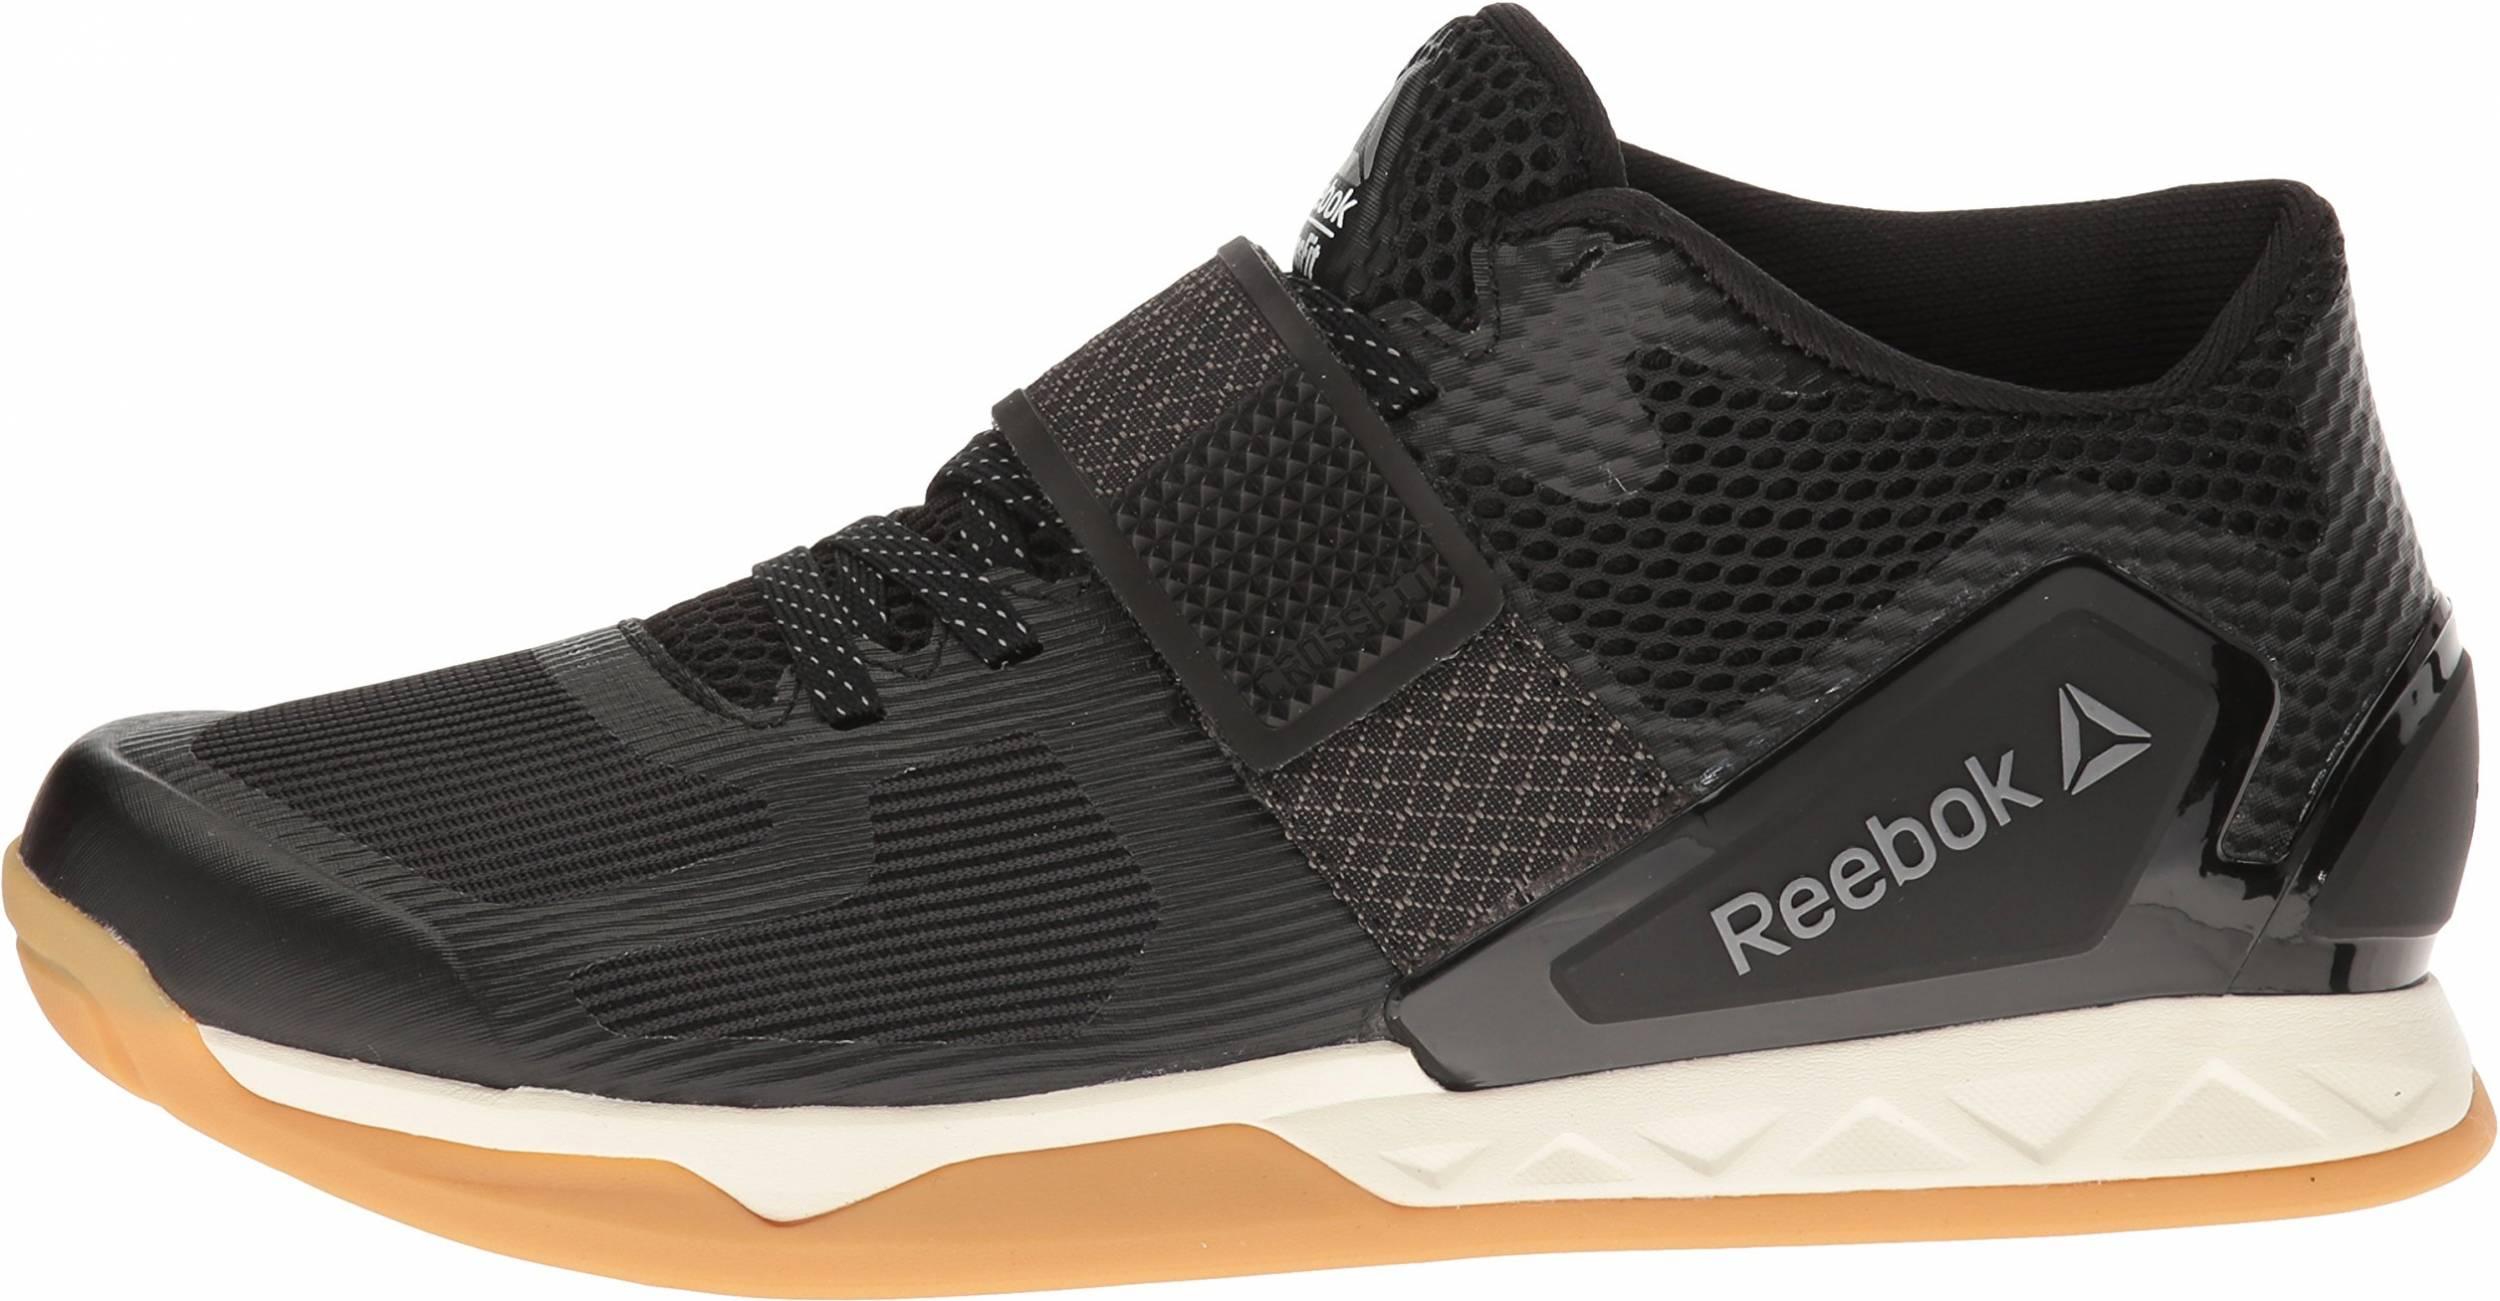 Save 47% on Reebok Crossfit Shoes (18